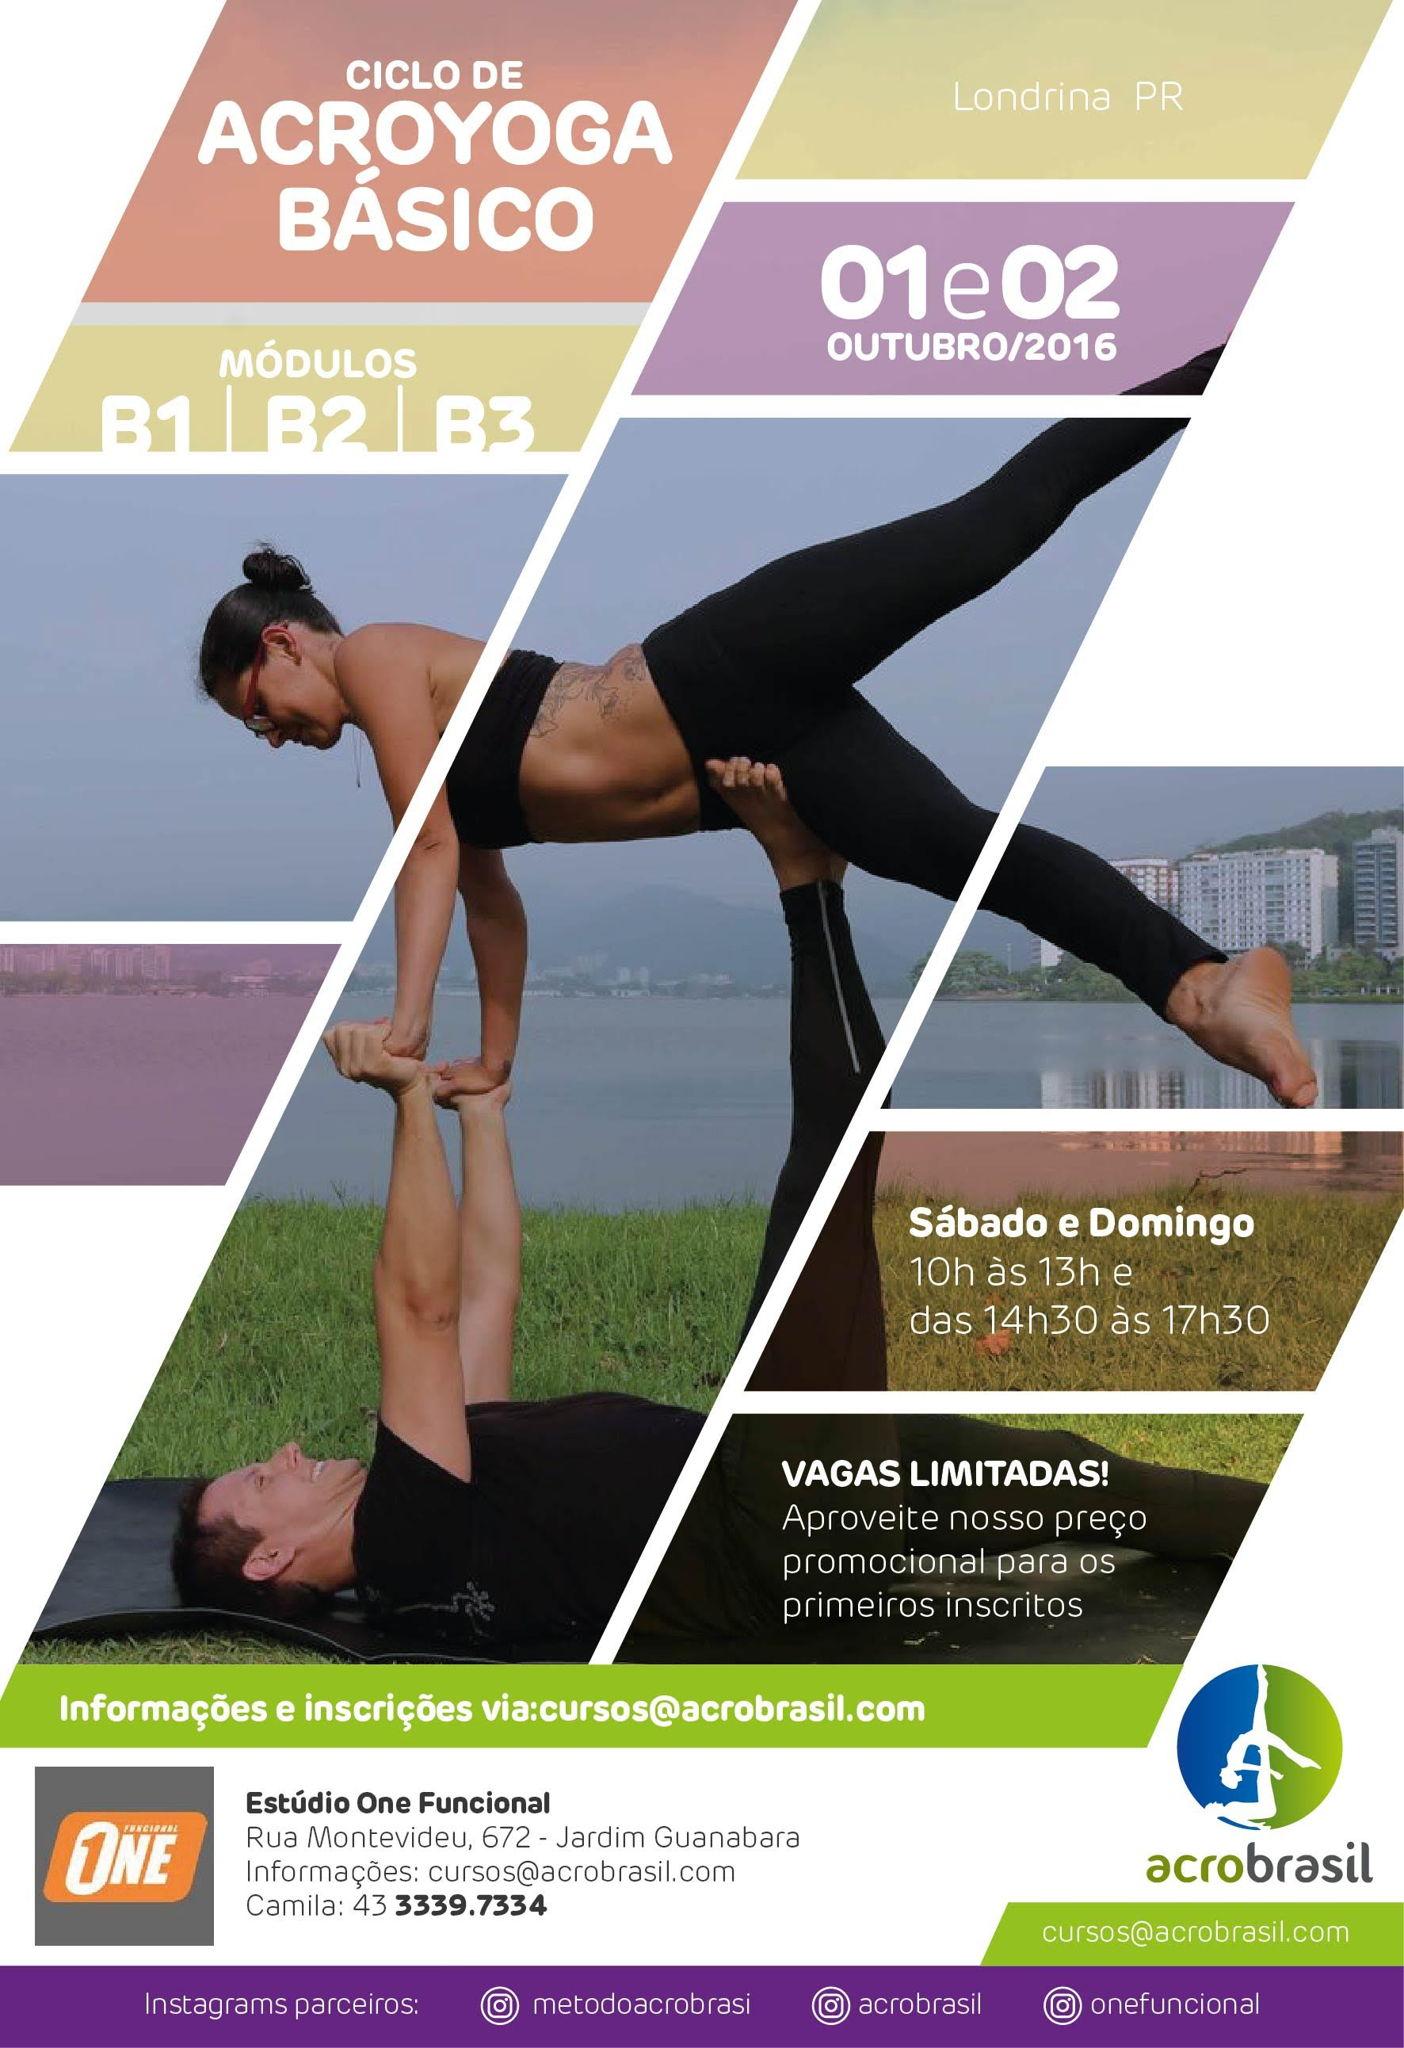 flyer_londrina_01-02-10.jpg